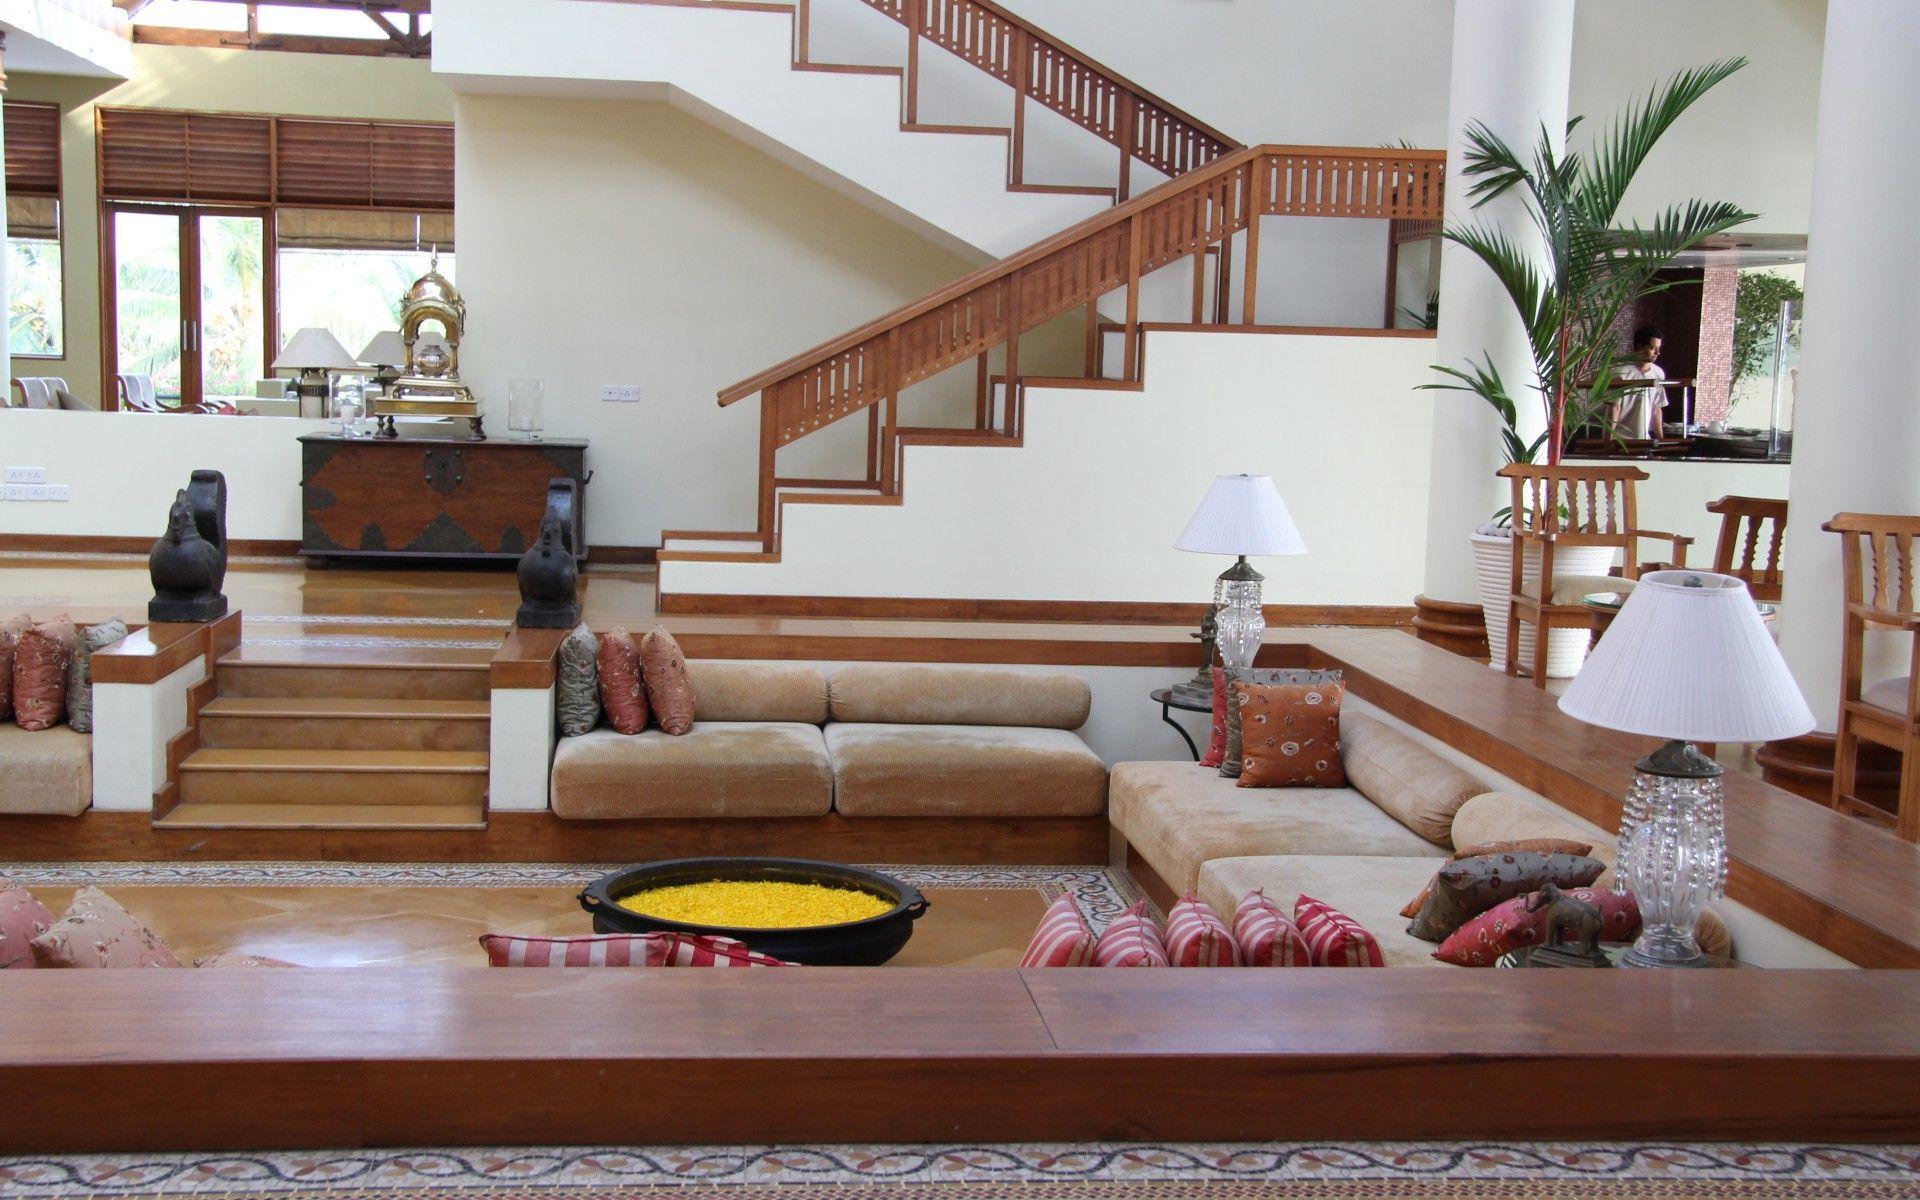 Beautiful House Interior Hd Wallpaper Beautiful House - Beautiful House Inside Hd , HD Wallpaper & Backgrounds